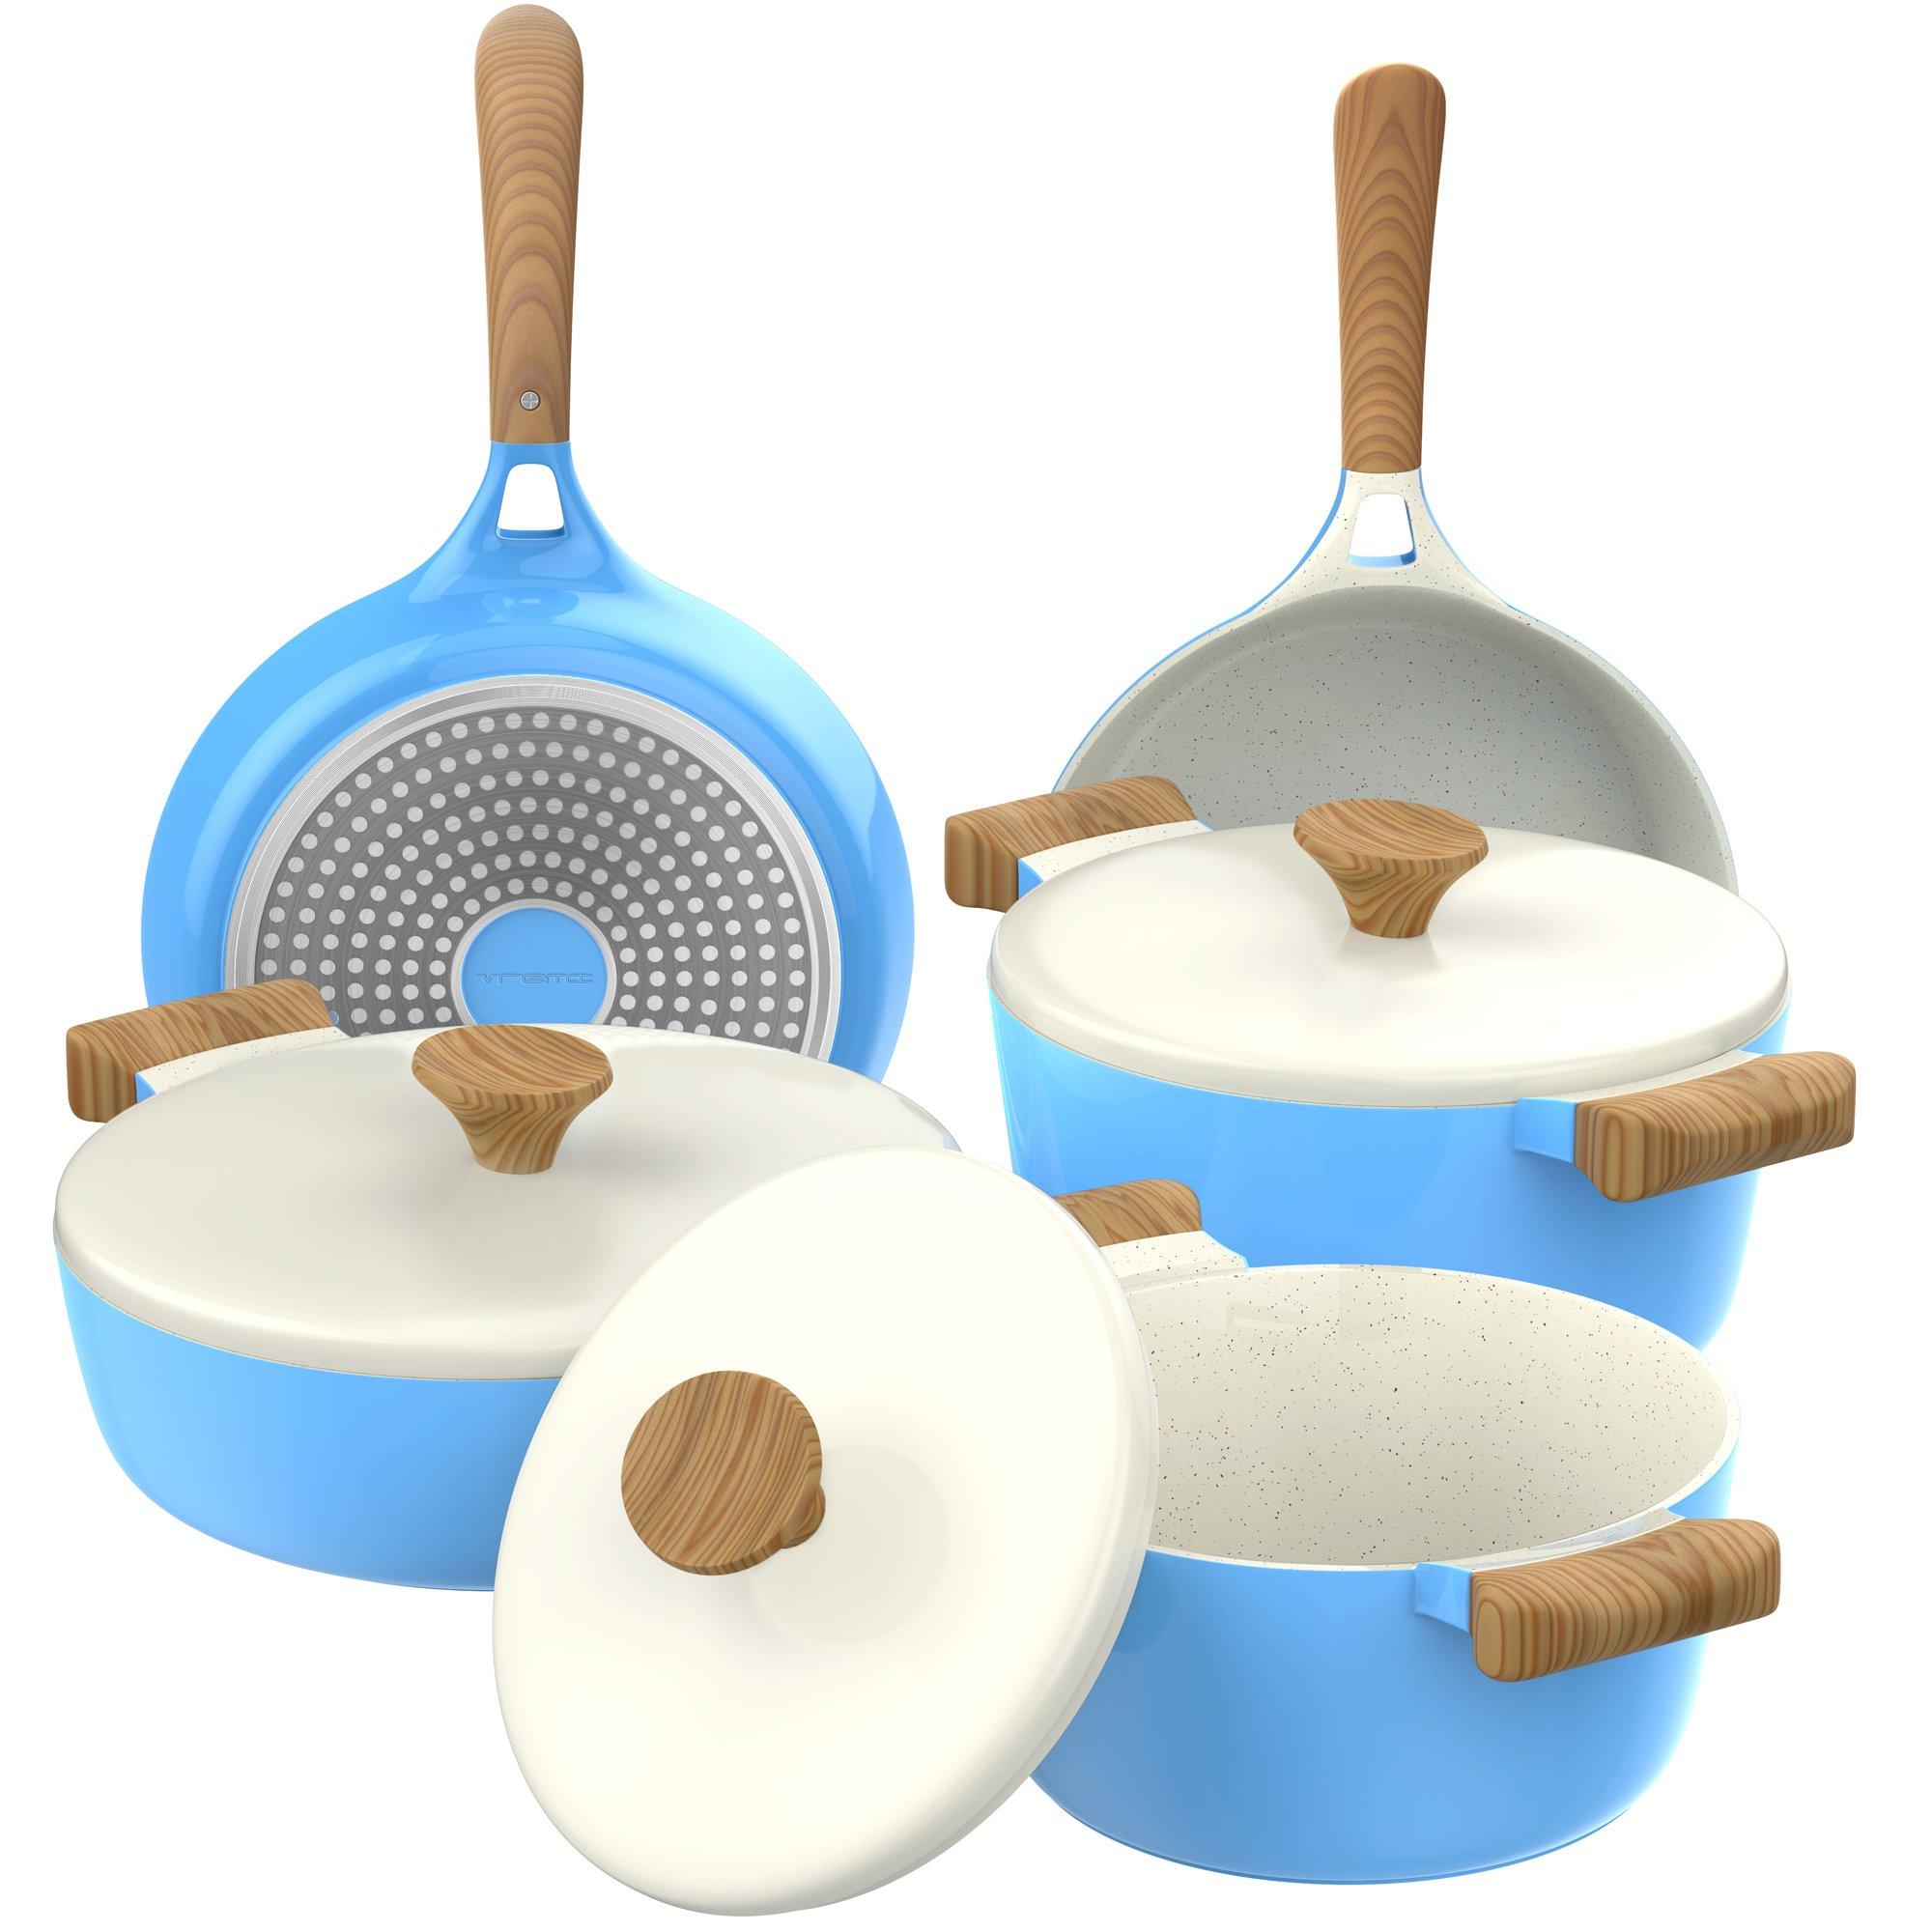 Vremi Piece Ceramic Nonstick Cookware